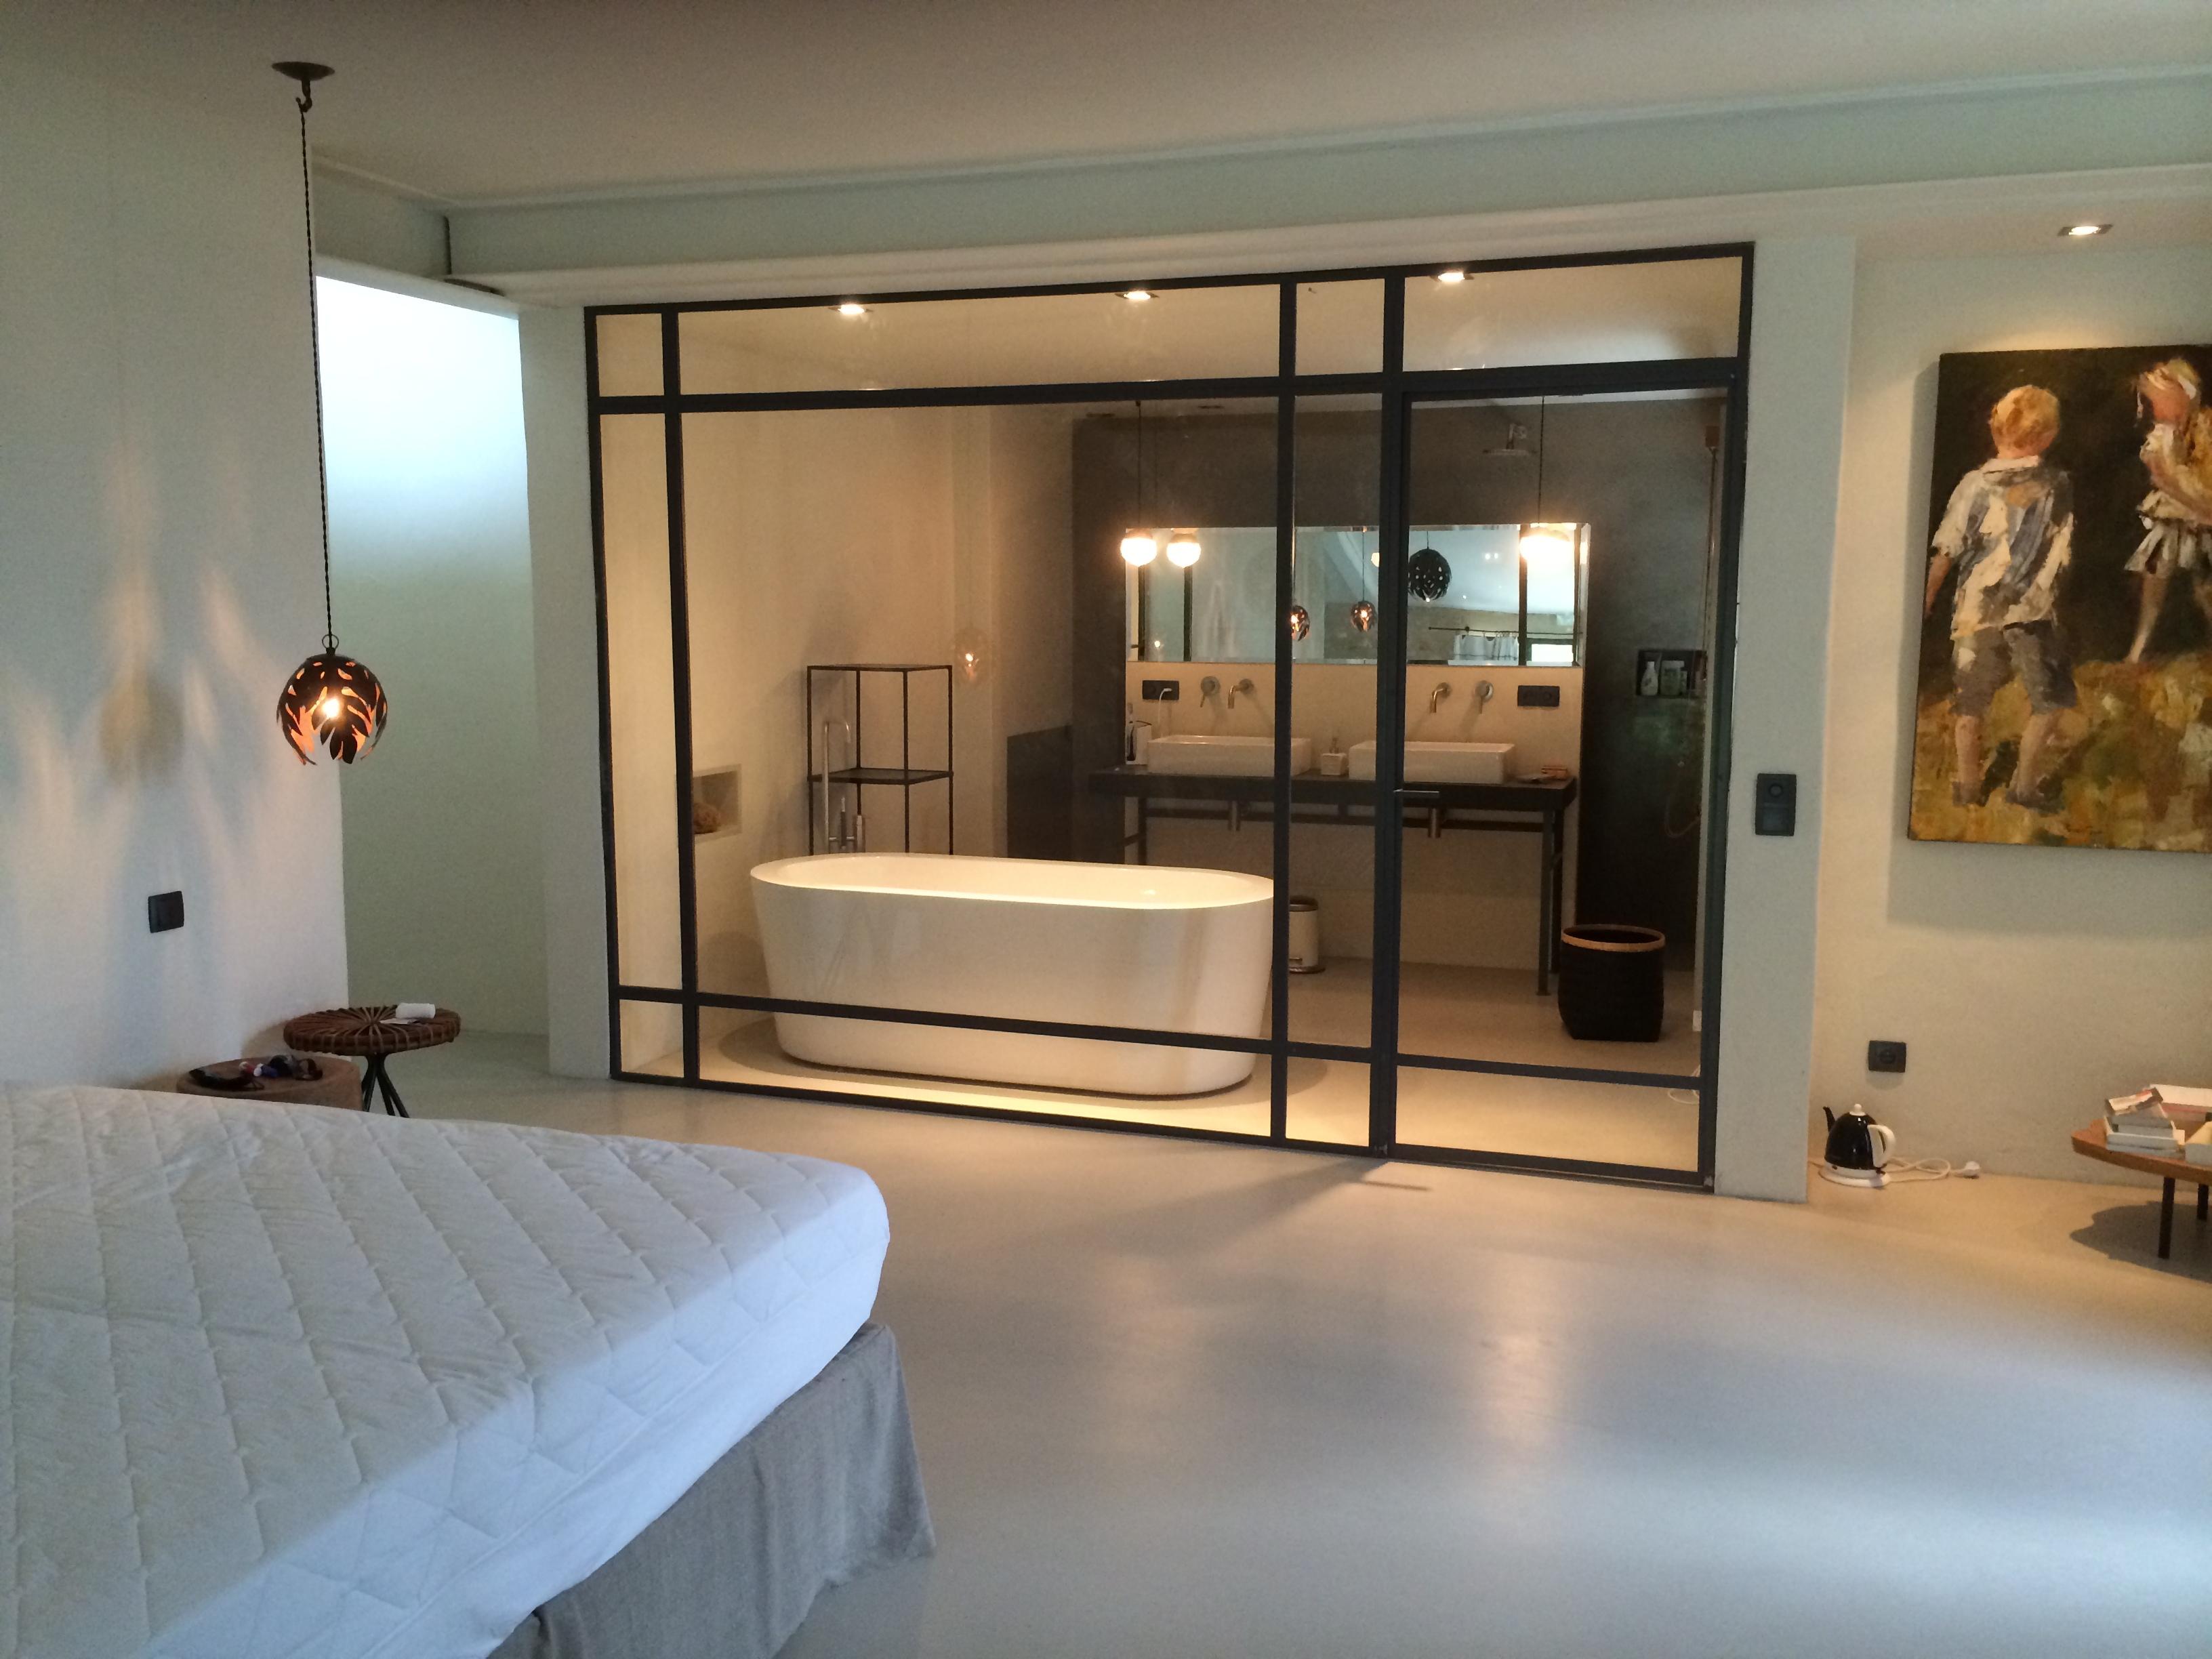 particulier b ton cir dans les hautes alpes sols techniques. Black Bedroom Furniture Sets. Home Design Ideas